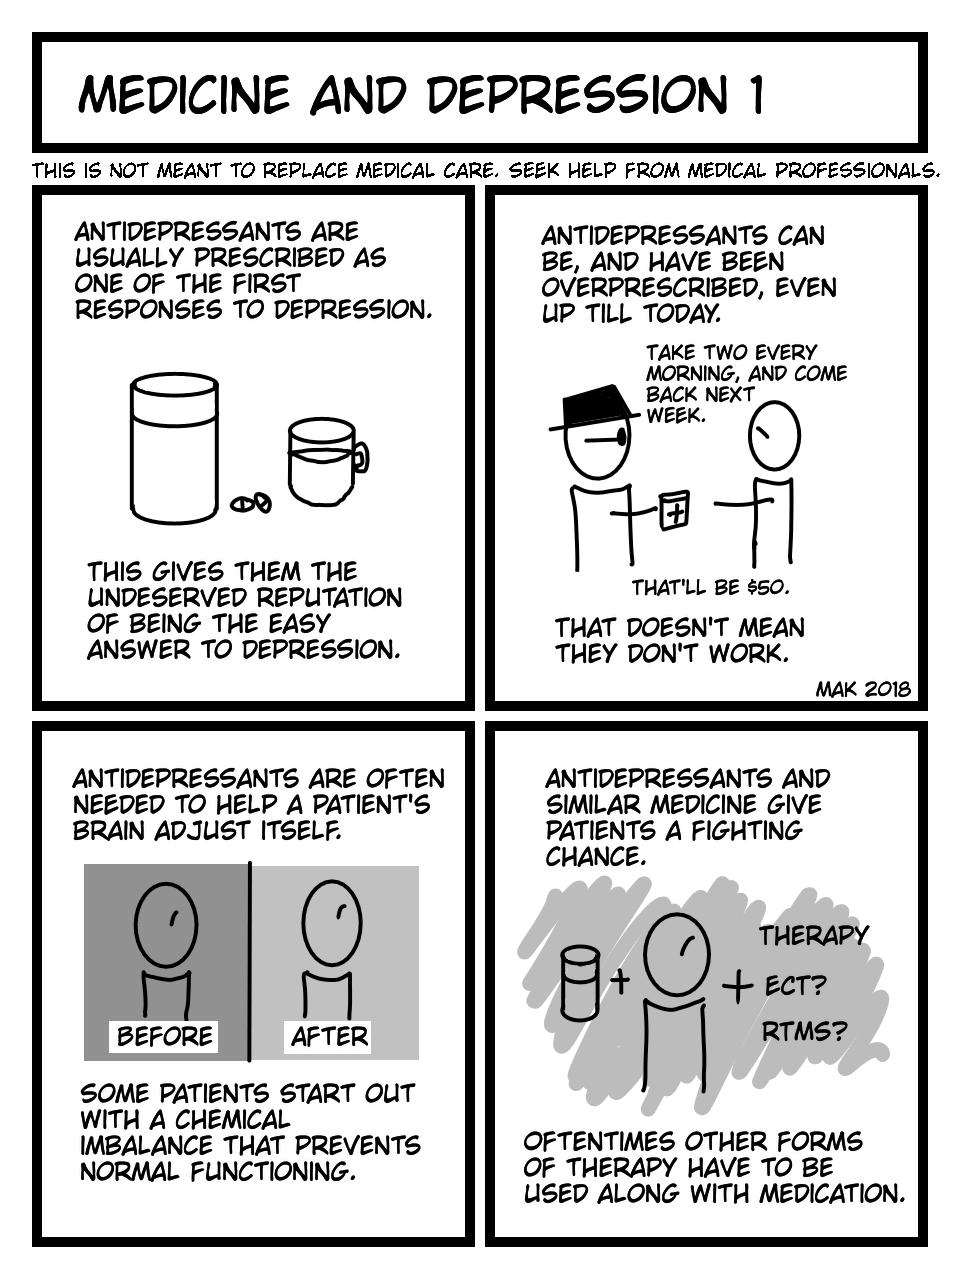 Medicine and Depression 1